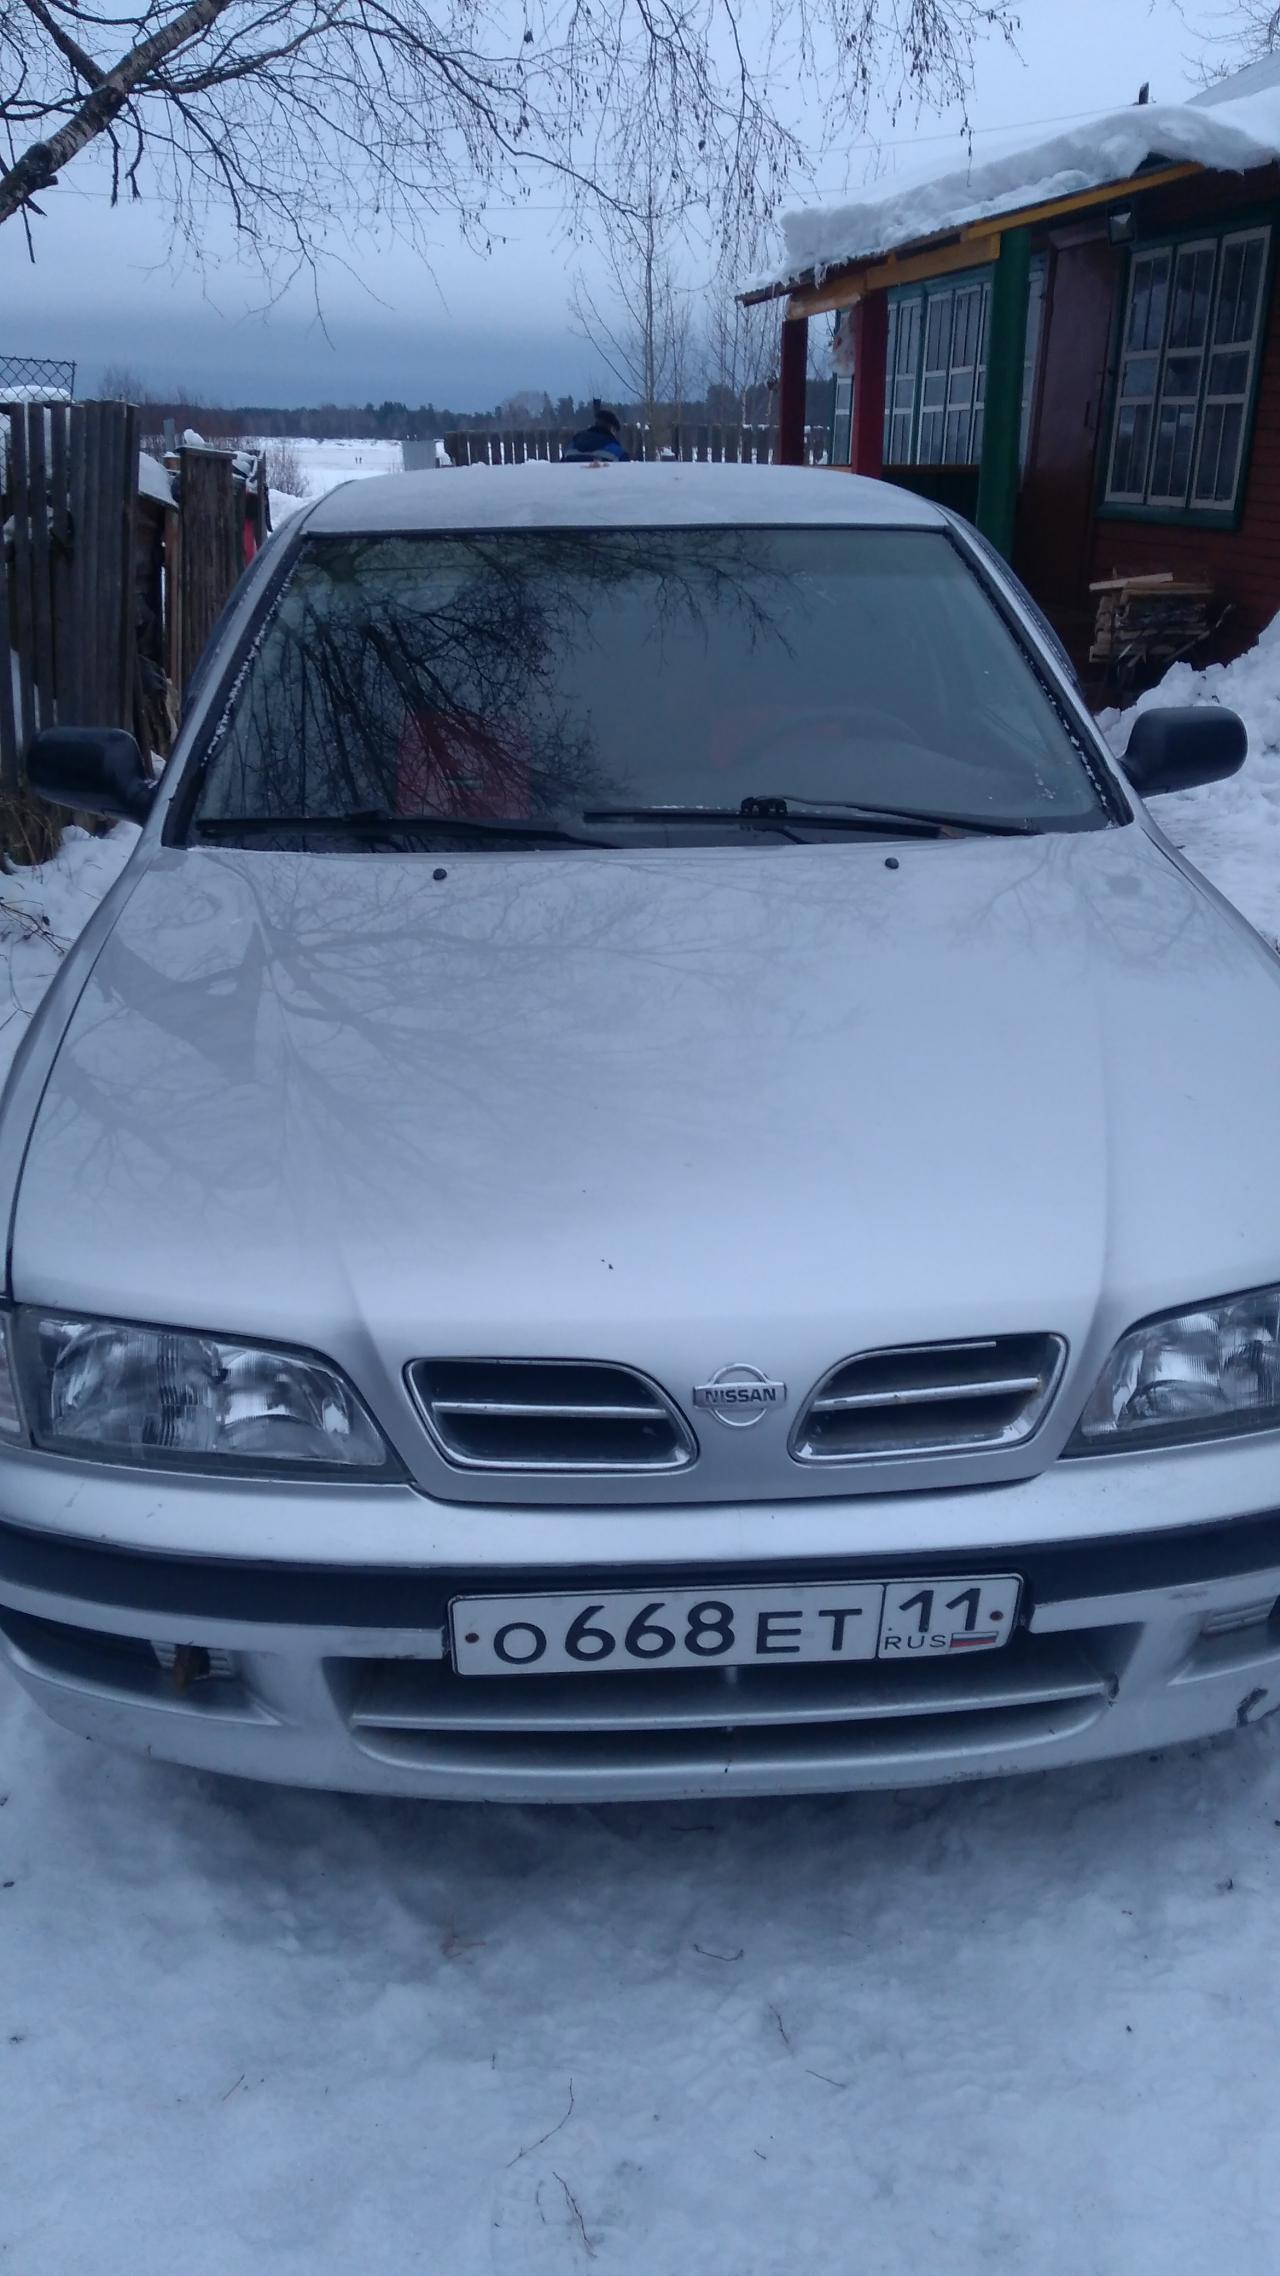 Nissan Primera 1997 г.в. г.Сыктывкар - фото 5